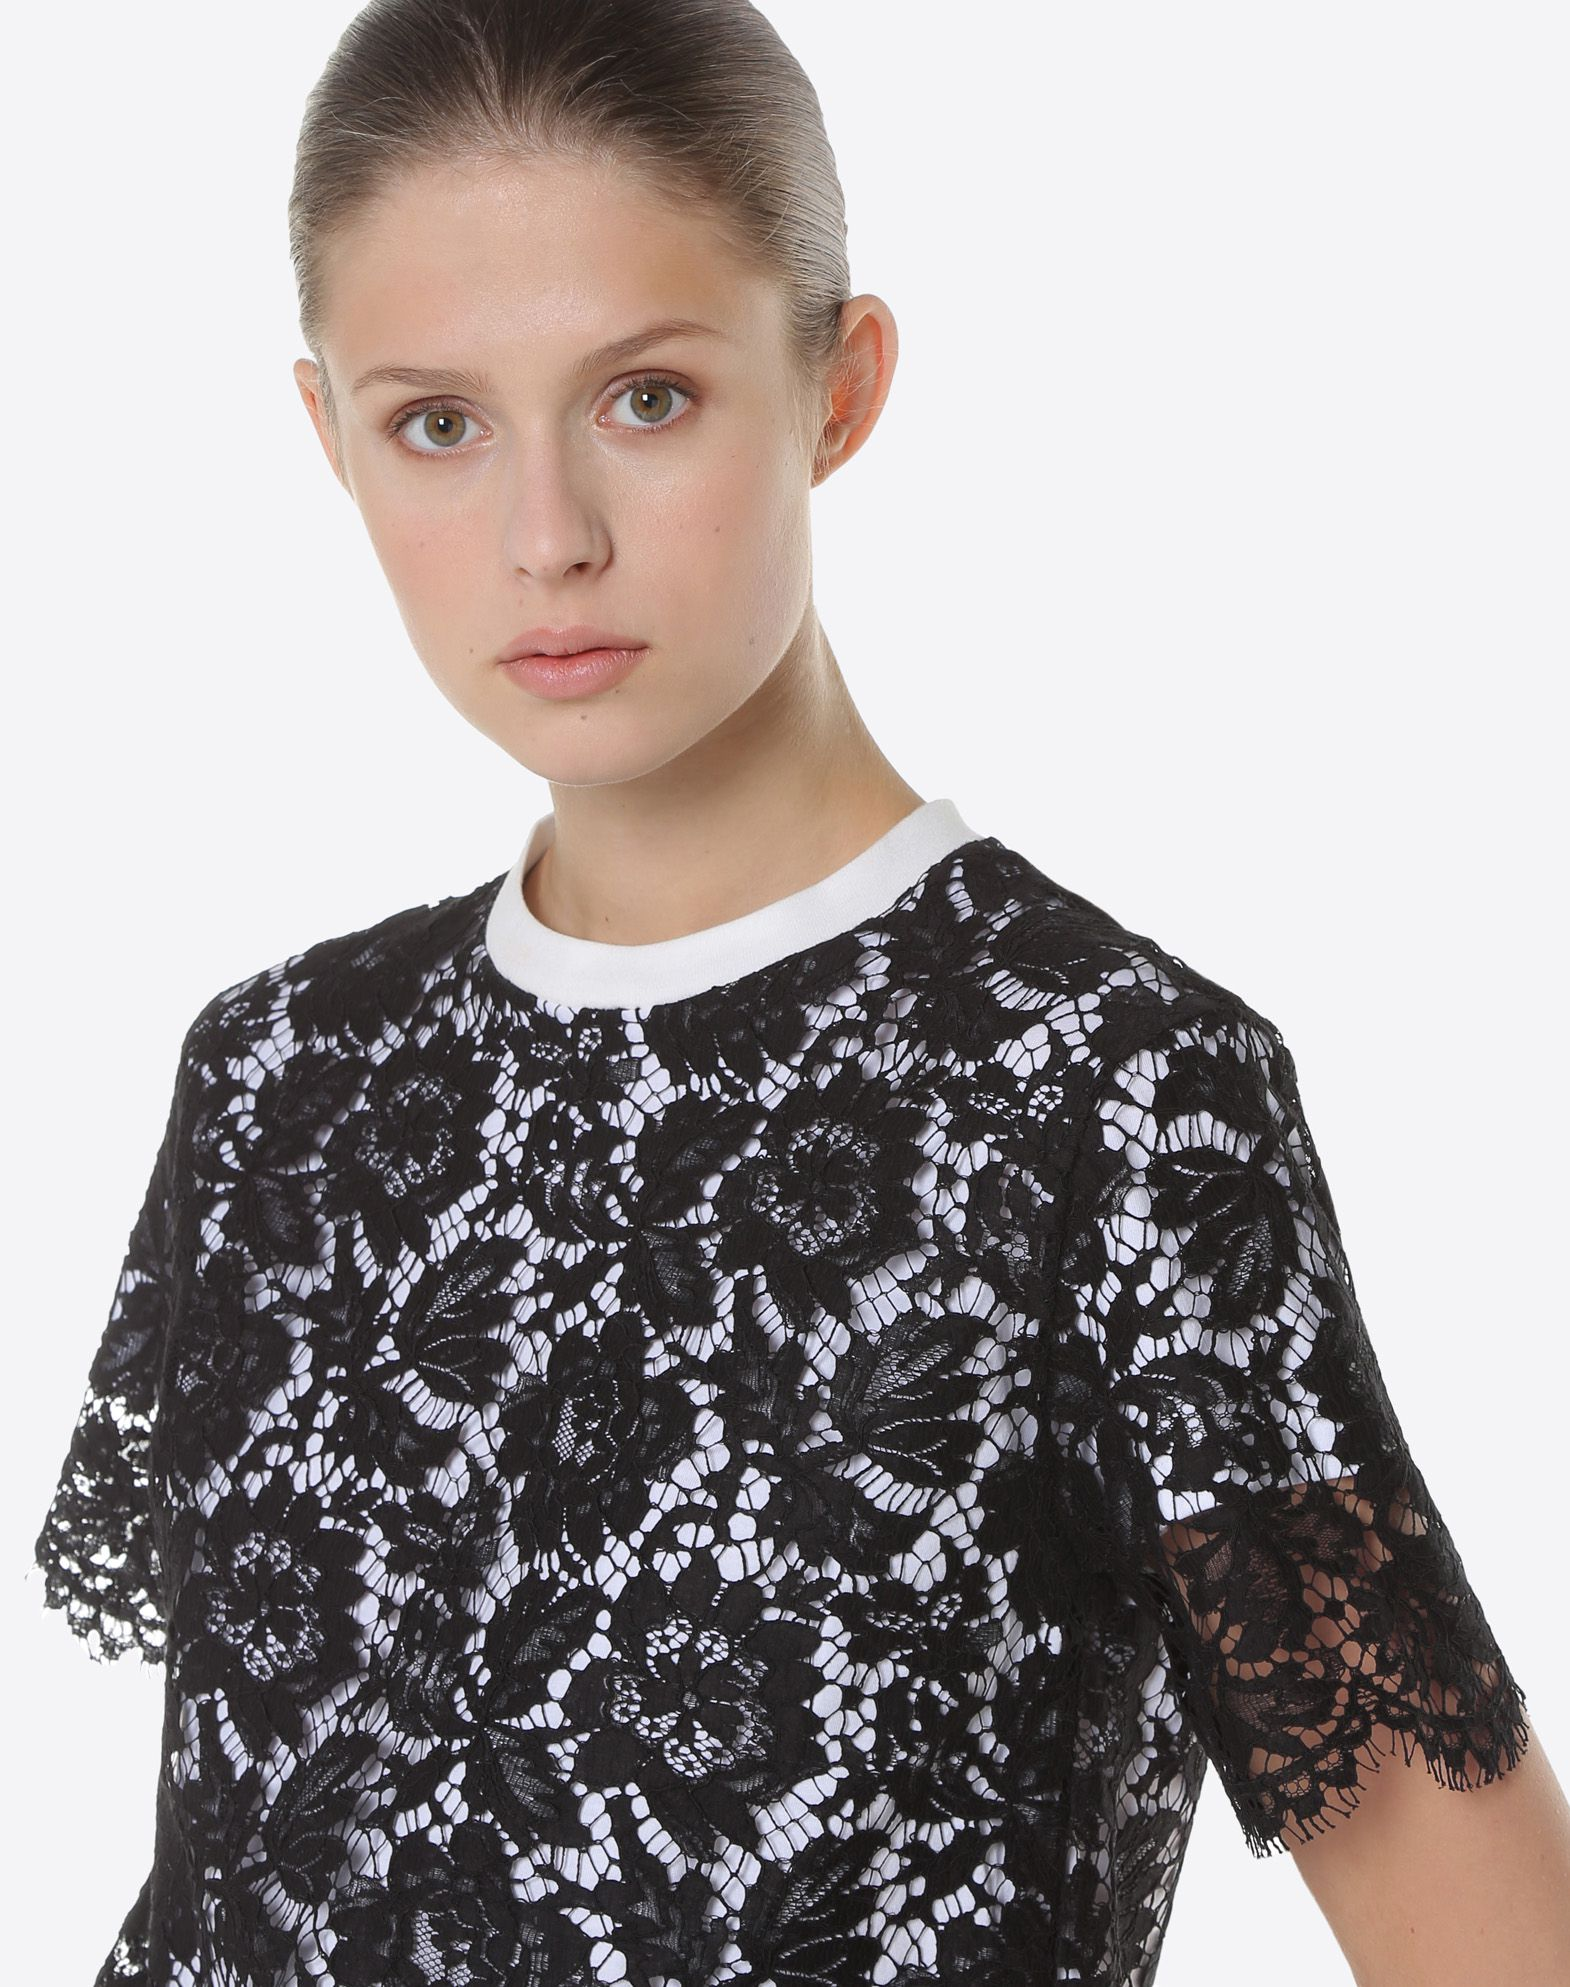 Valentino Heavy Lace T-shirt Cheap Sale Online 5zhOnrMxR